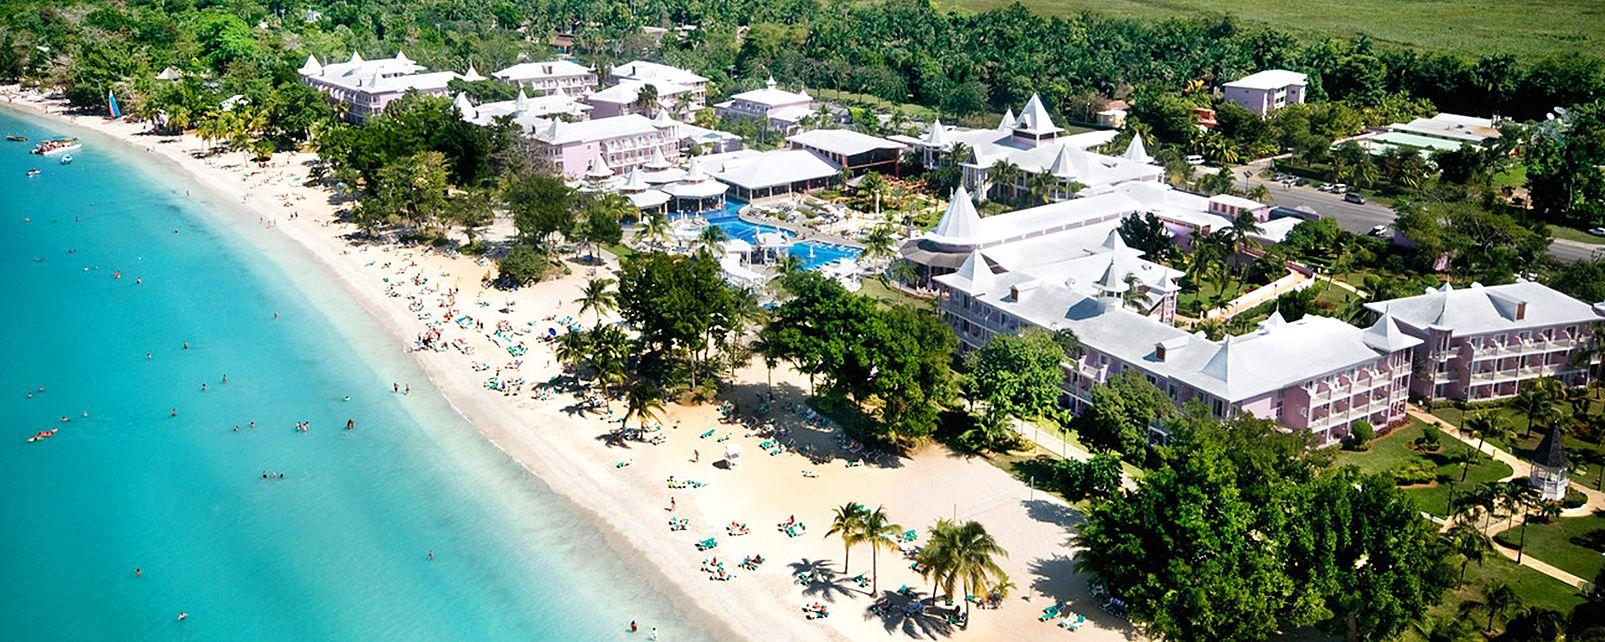 Hôtel Riu Palace Tropical Bay All Inclusive